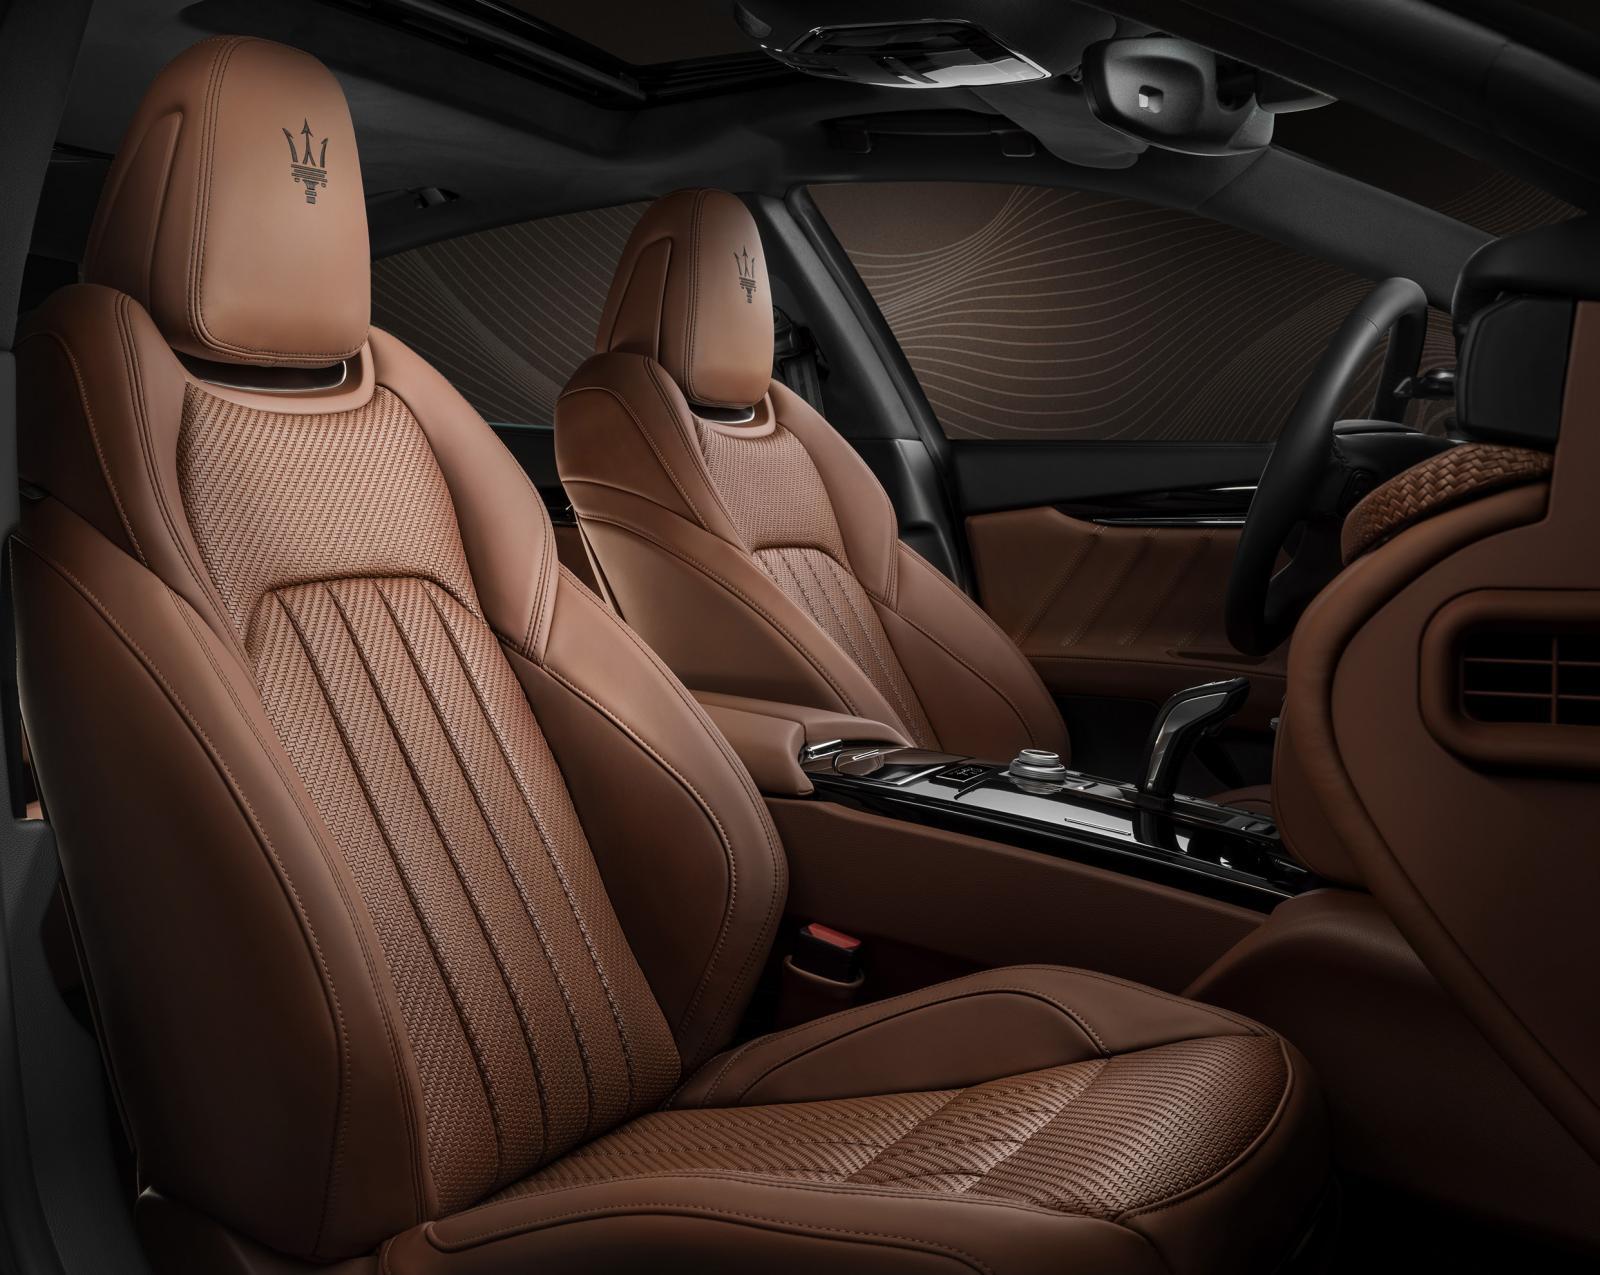 16384-MaseratiQuattroporteRoyale-ZEGNAPelletessutainterior